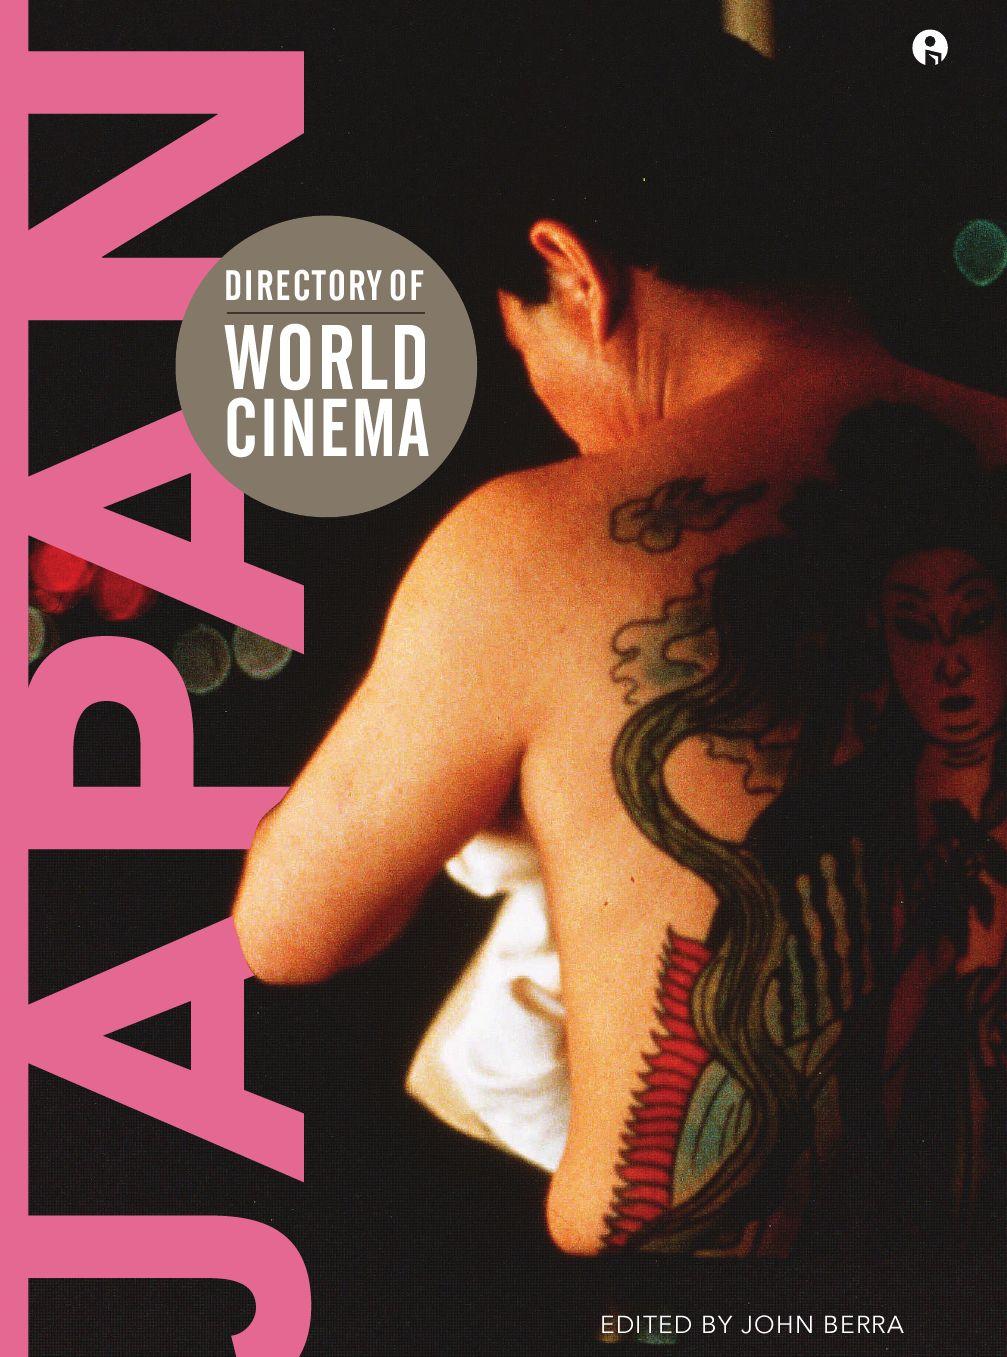 Actor Porno Kohei the directory of world cinema: japanotaku magazine - issuu